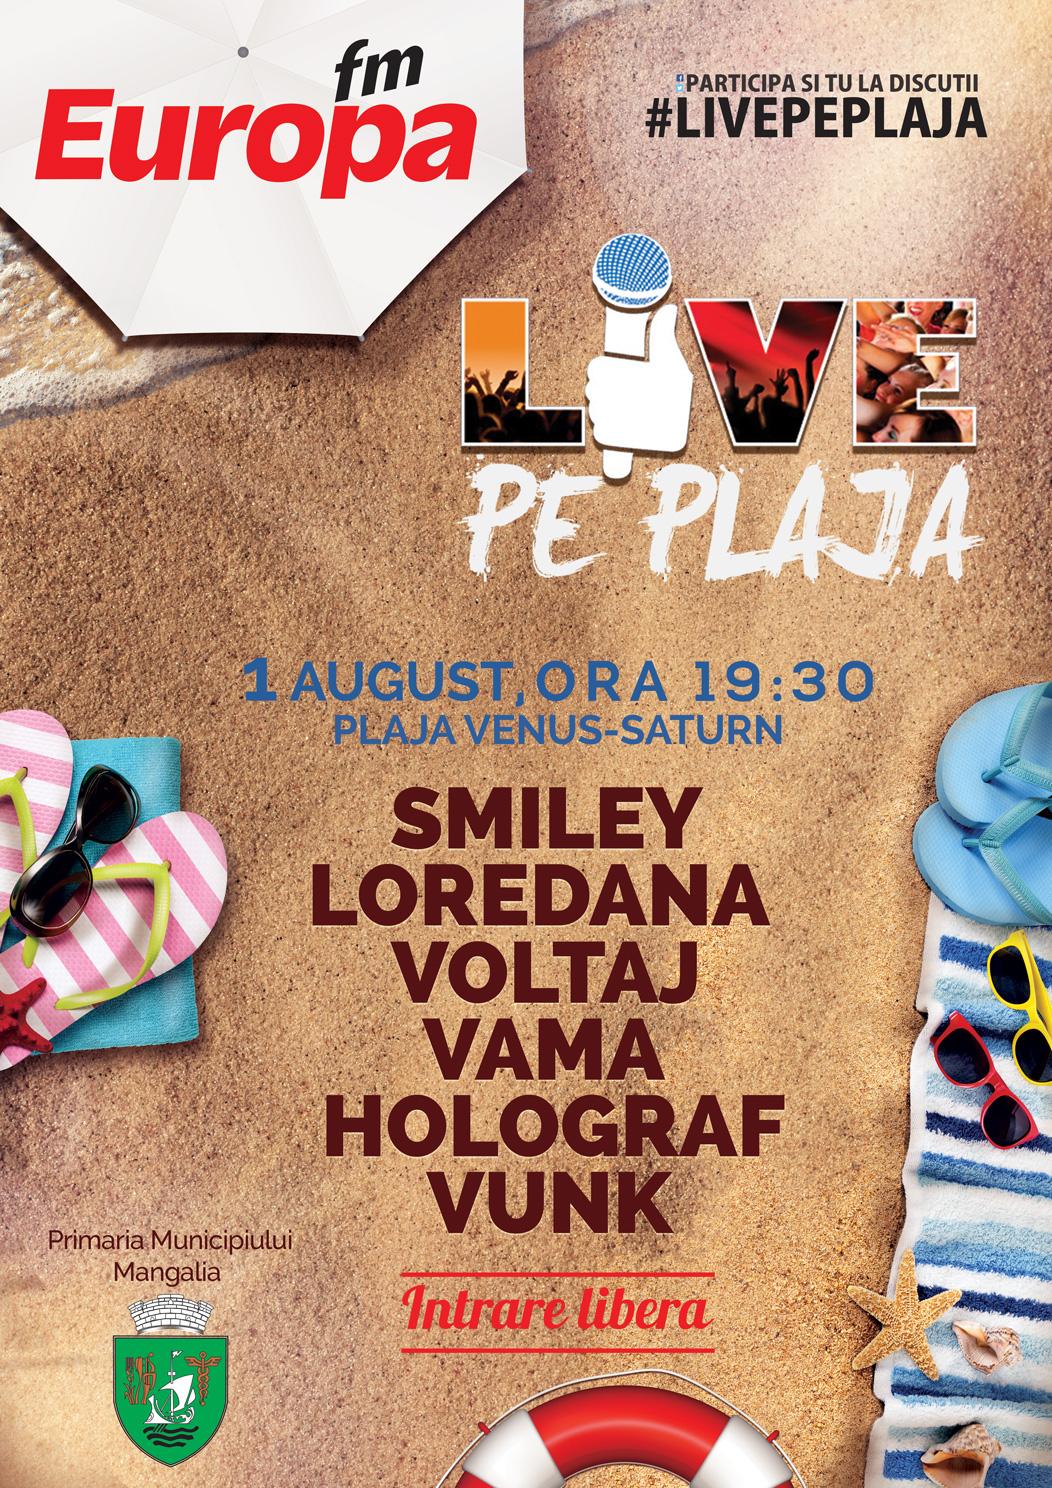 Europa-FM-Live-pe-plaja-2015-livepeplaja